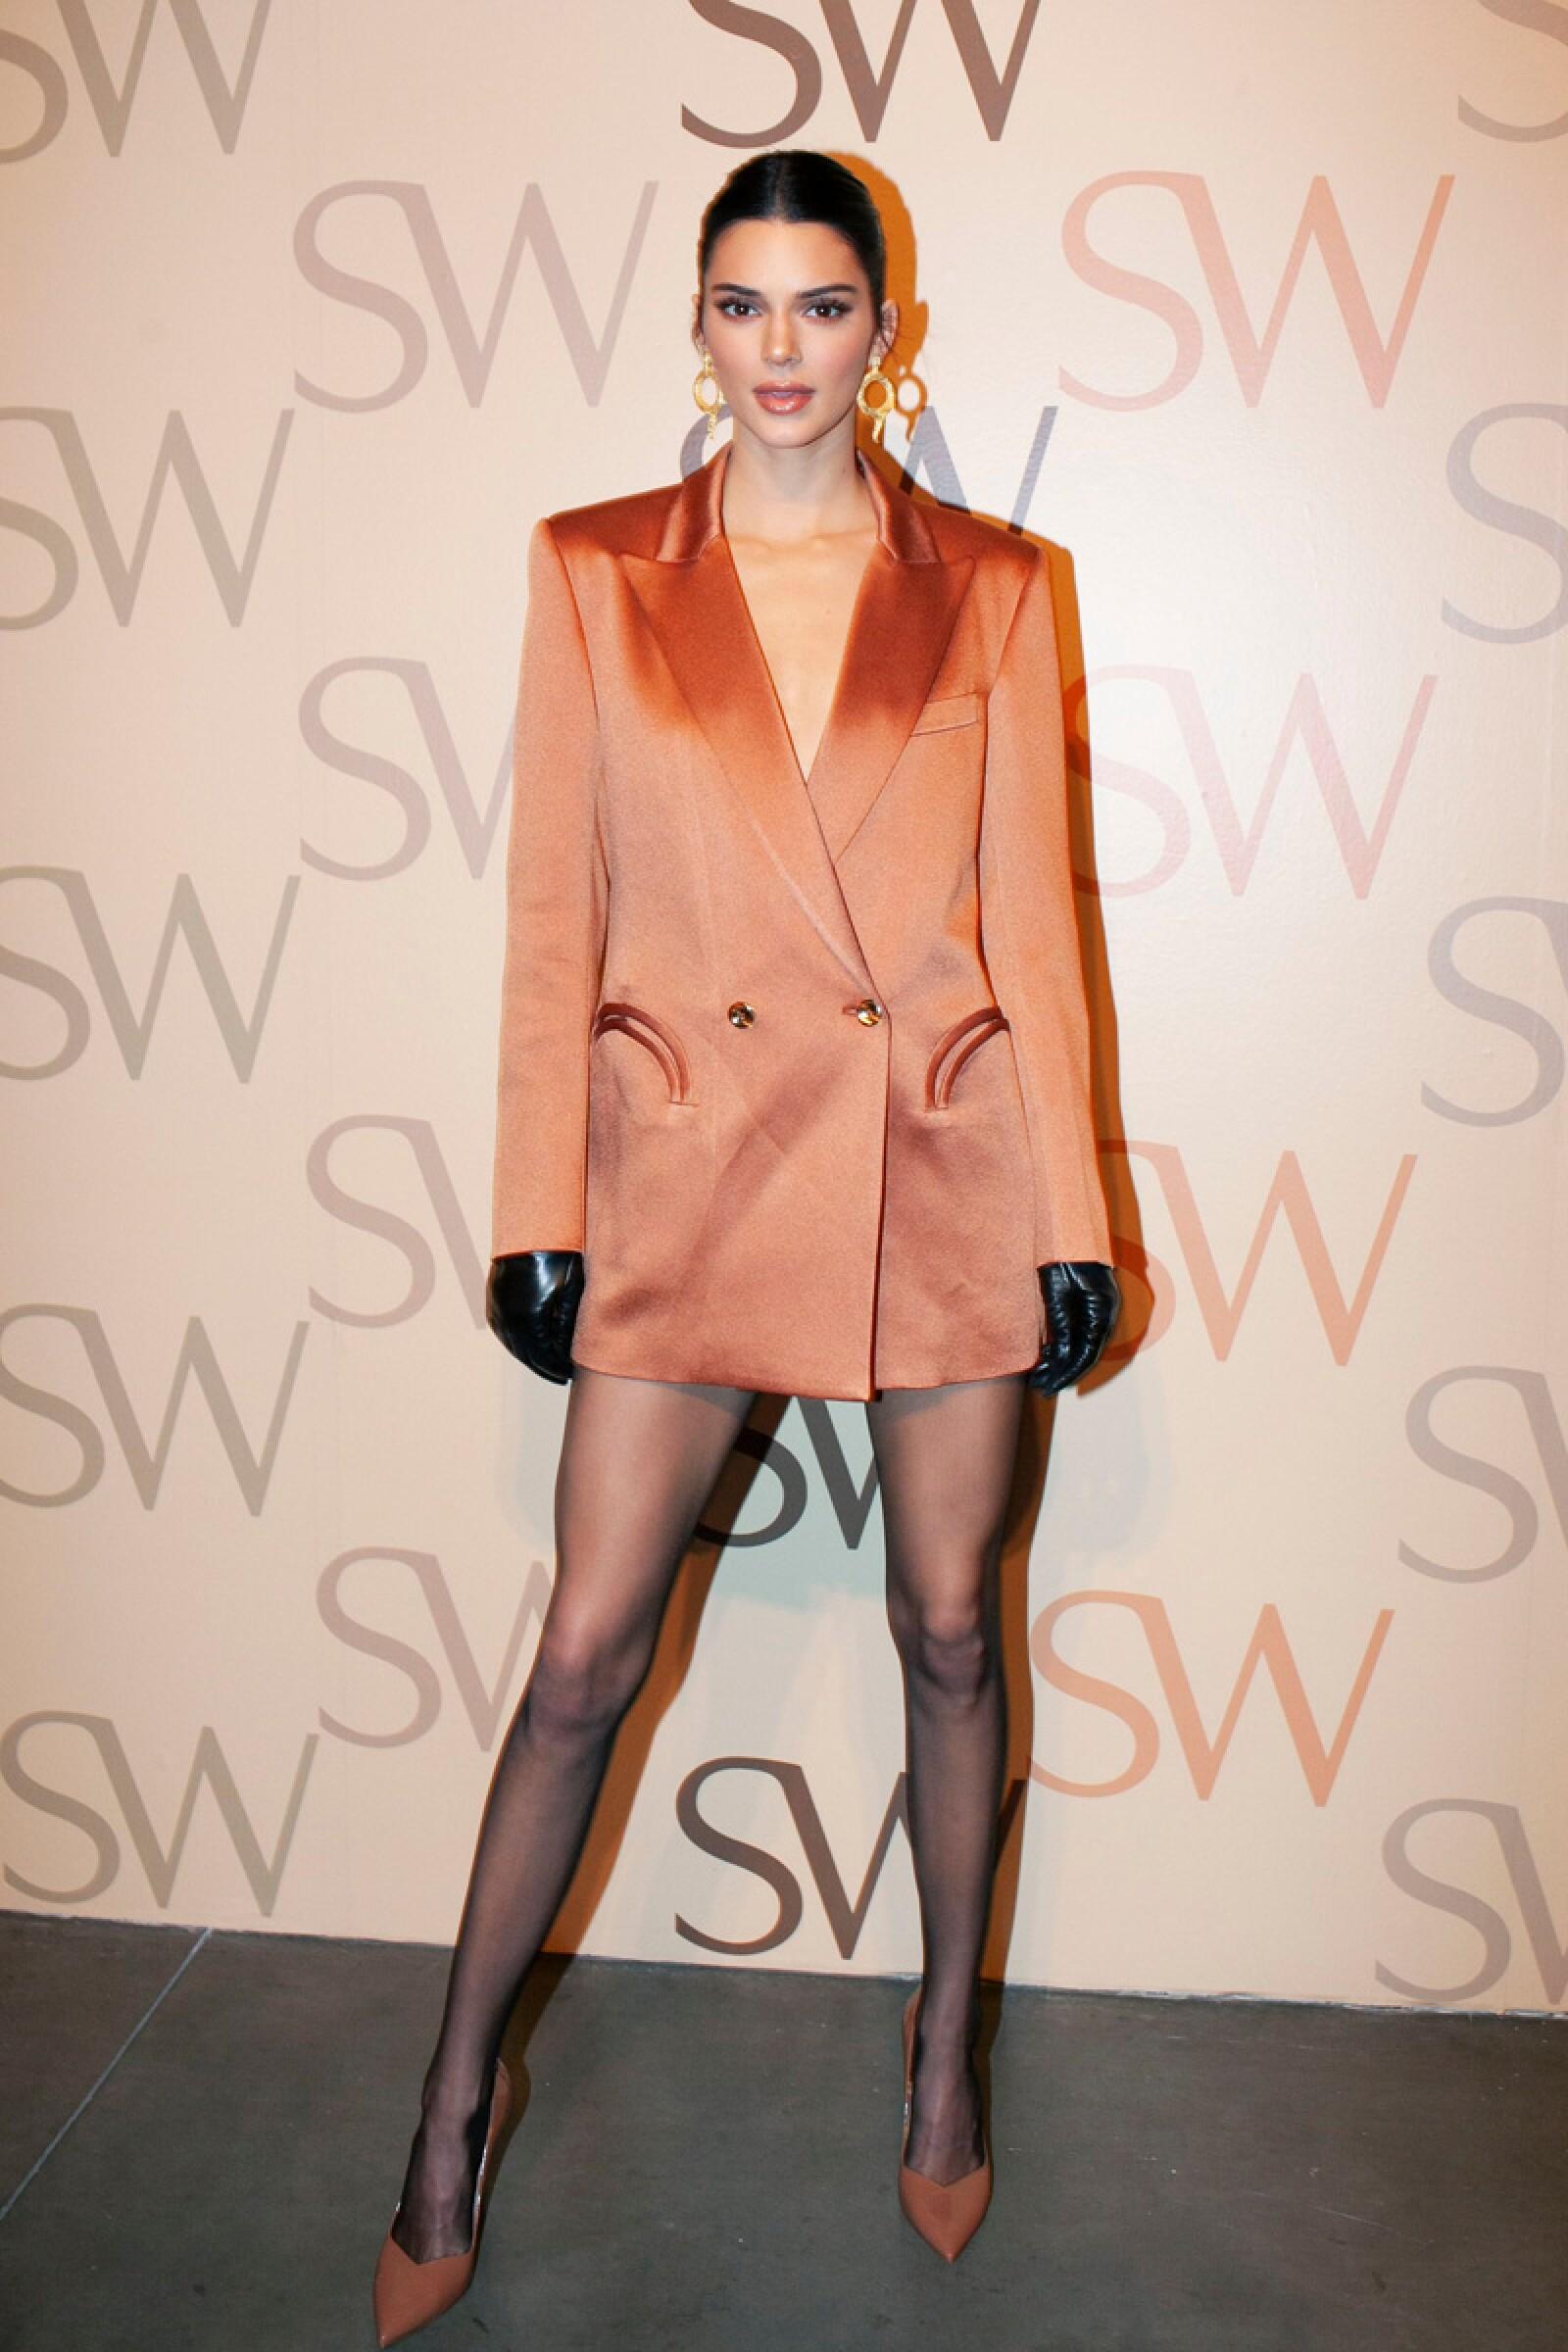 Stuart Weitzman Spring 2019 Campaign Release Party, New York Fashion Week, USA - 12 Feb 2019